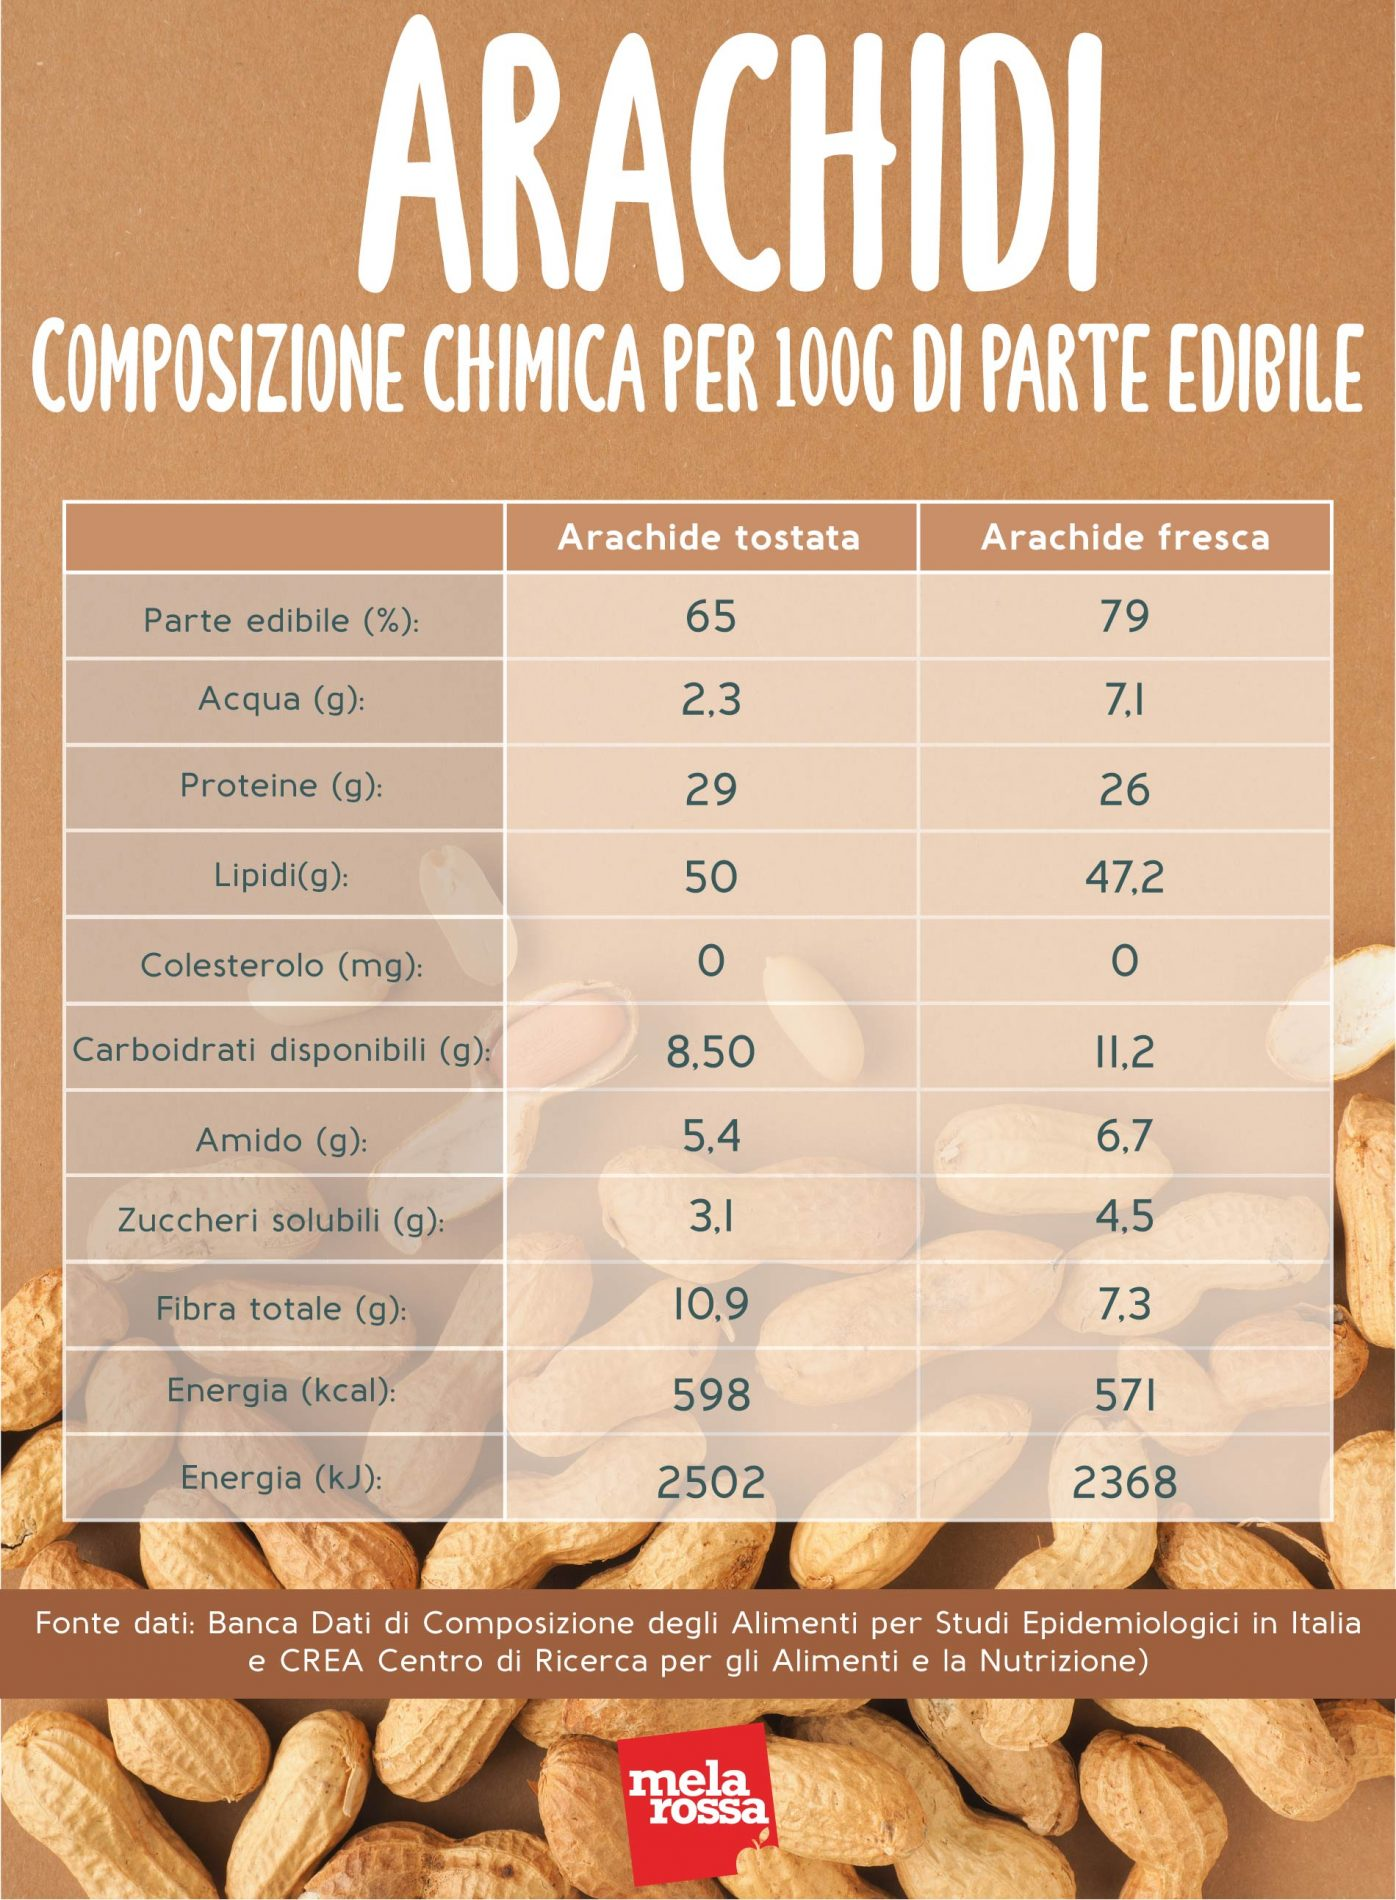 arachidi freschi e tostati: composizione chimica